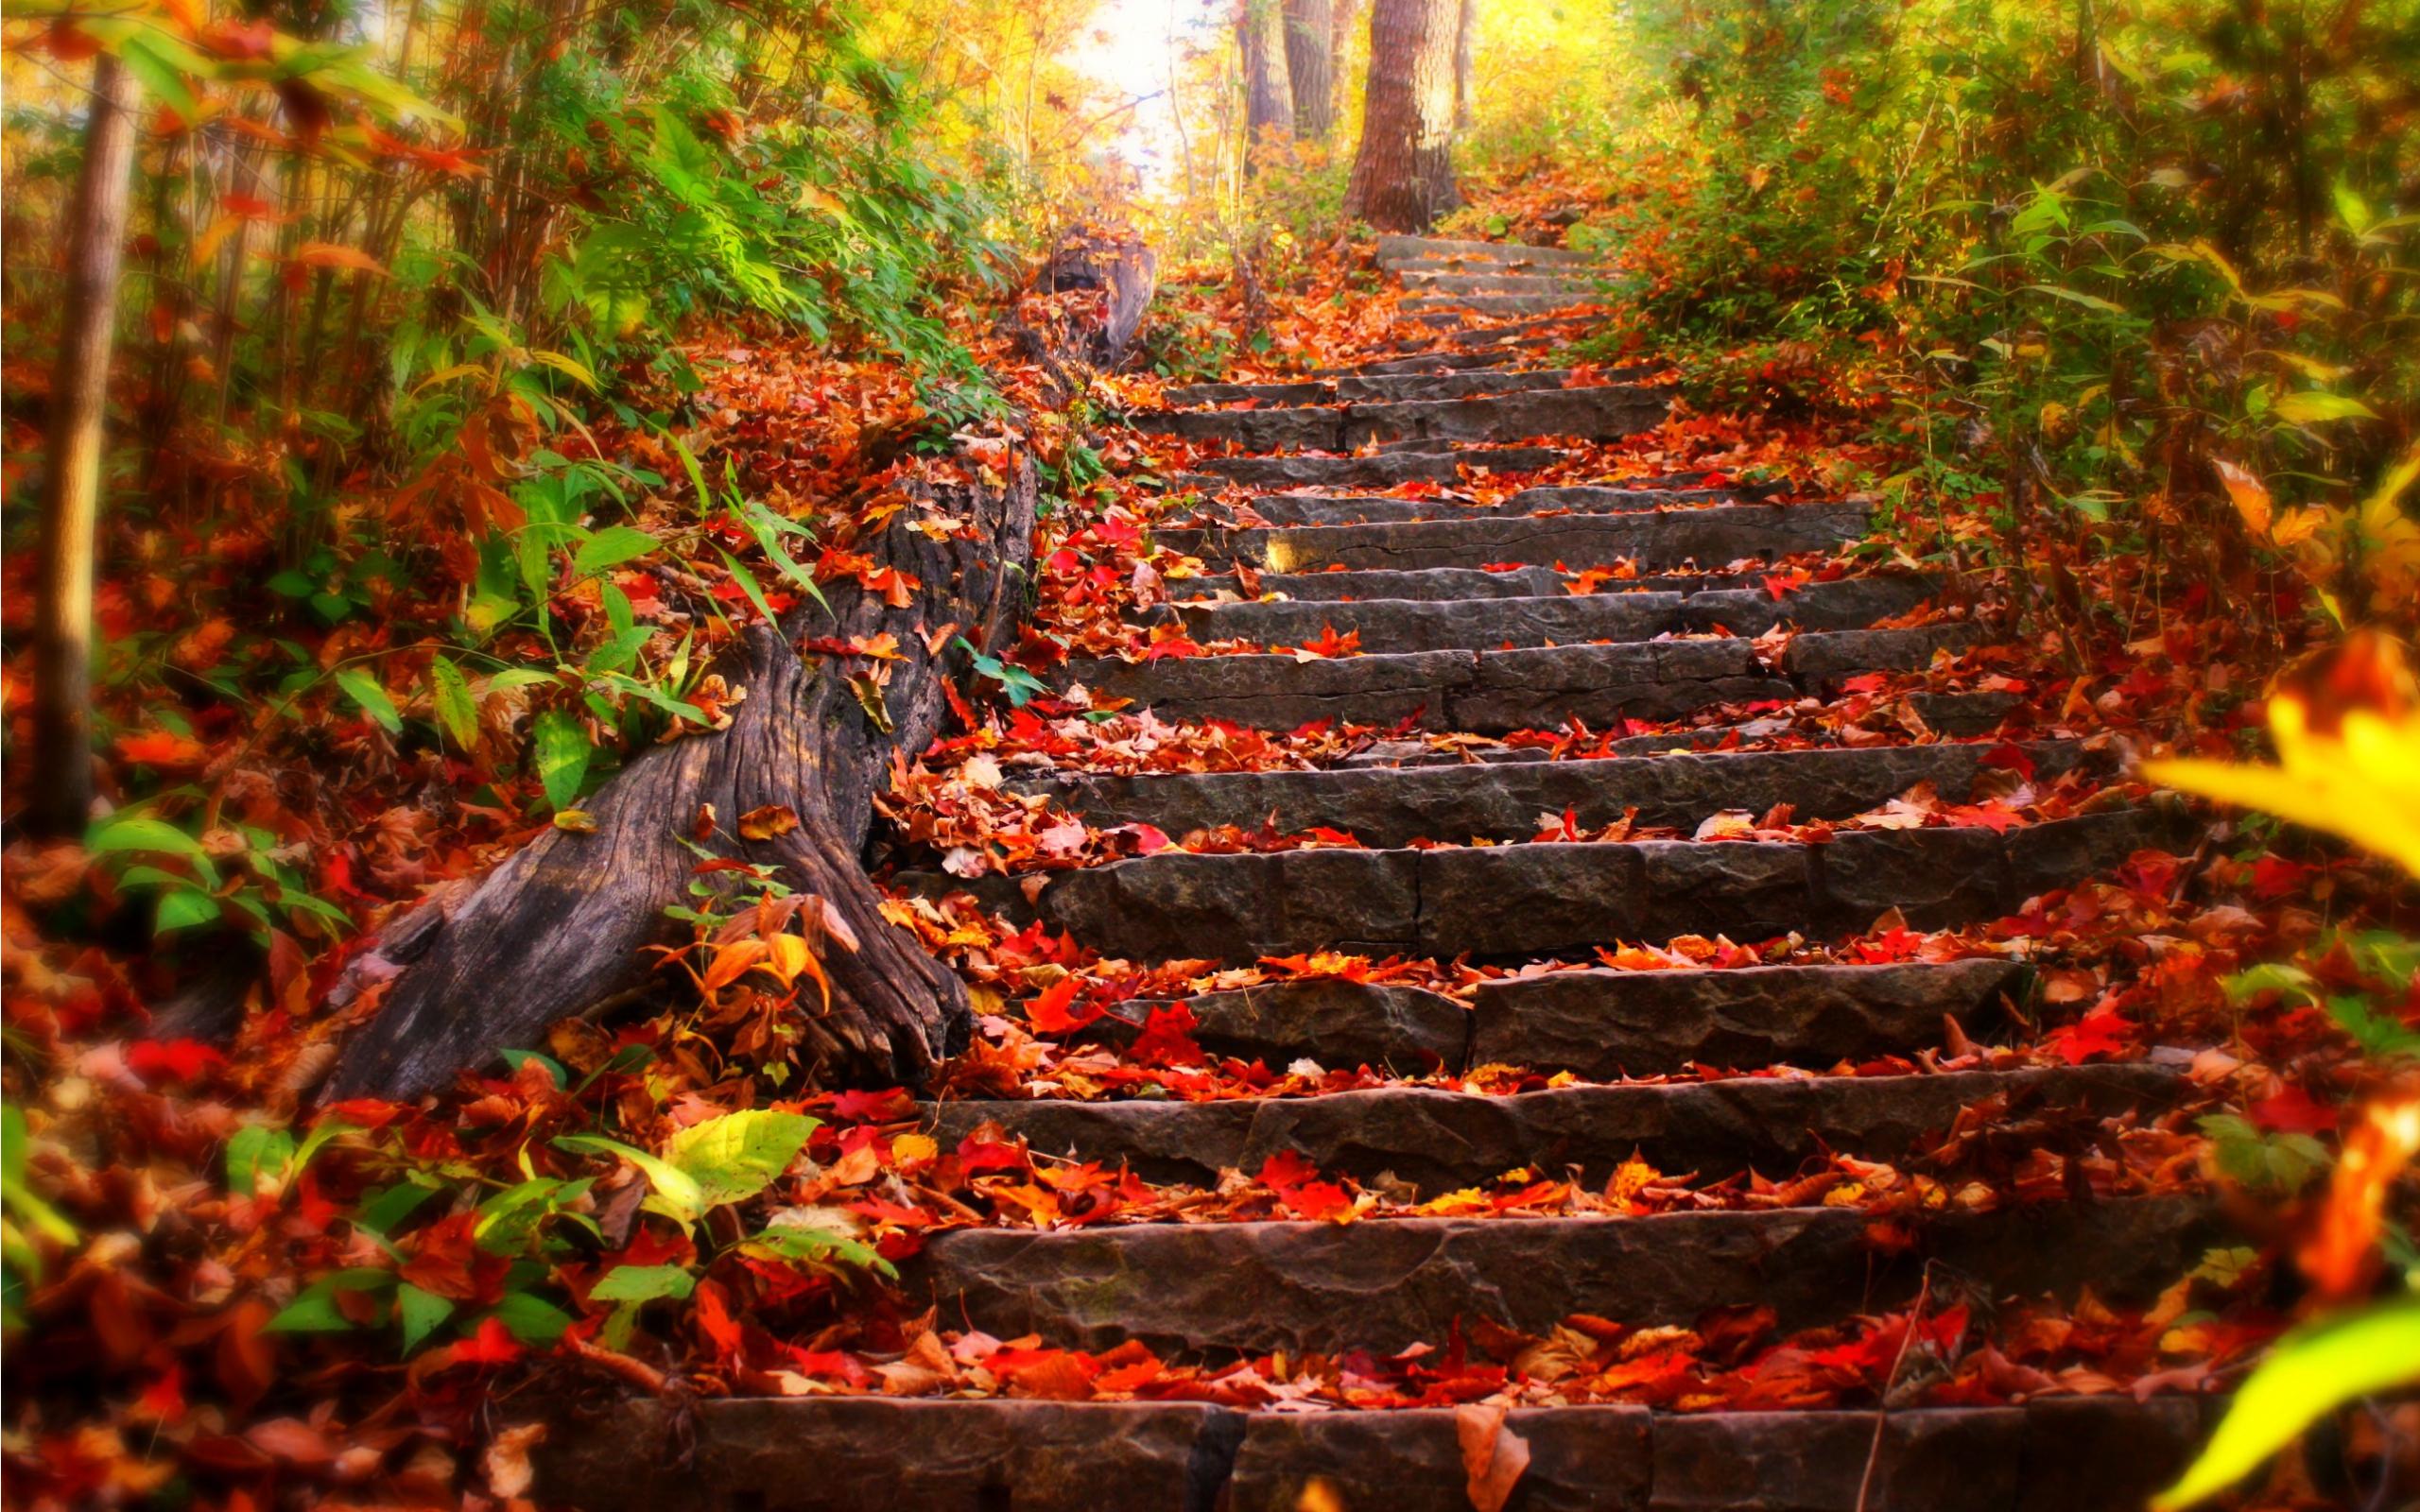 comautumnautumn free wallpaper autumn leaves 93069htm 2560x1600